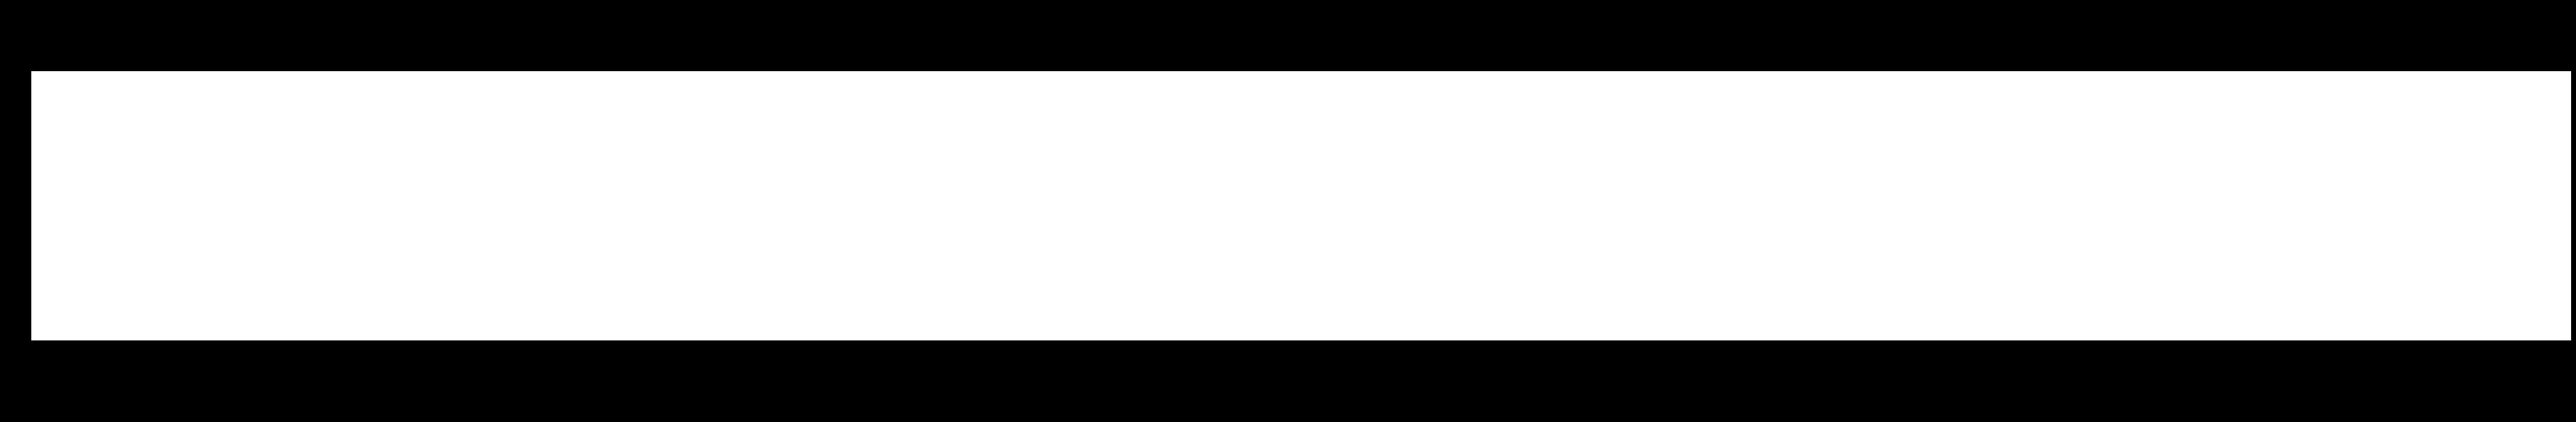 ProteoNova Inc